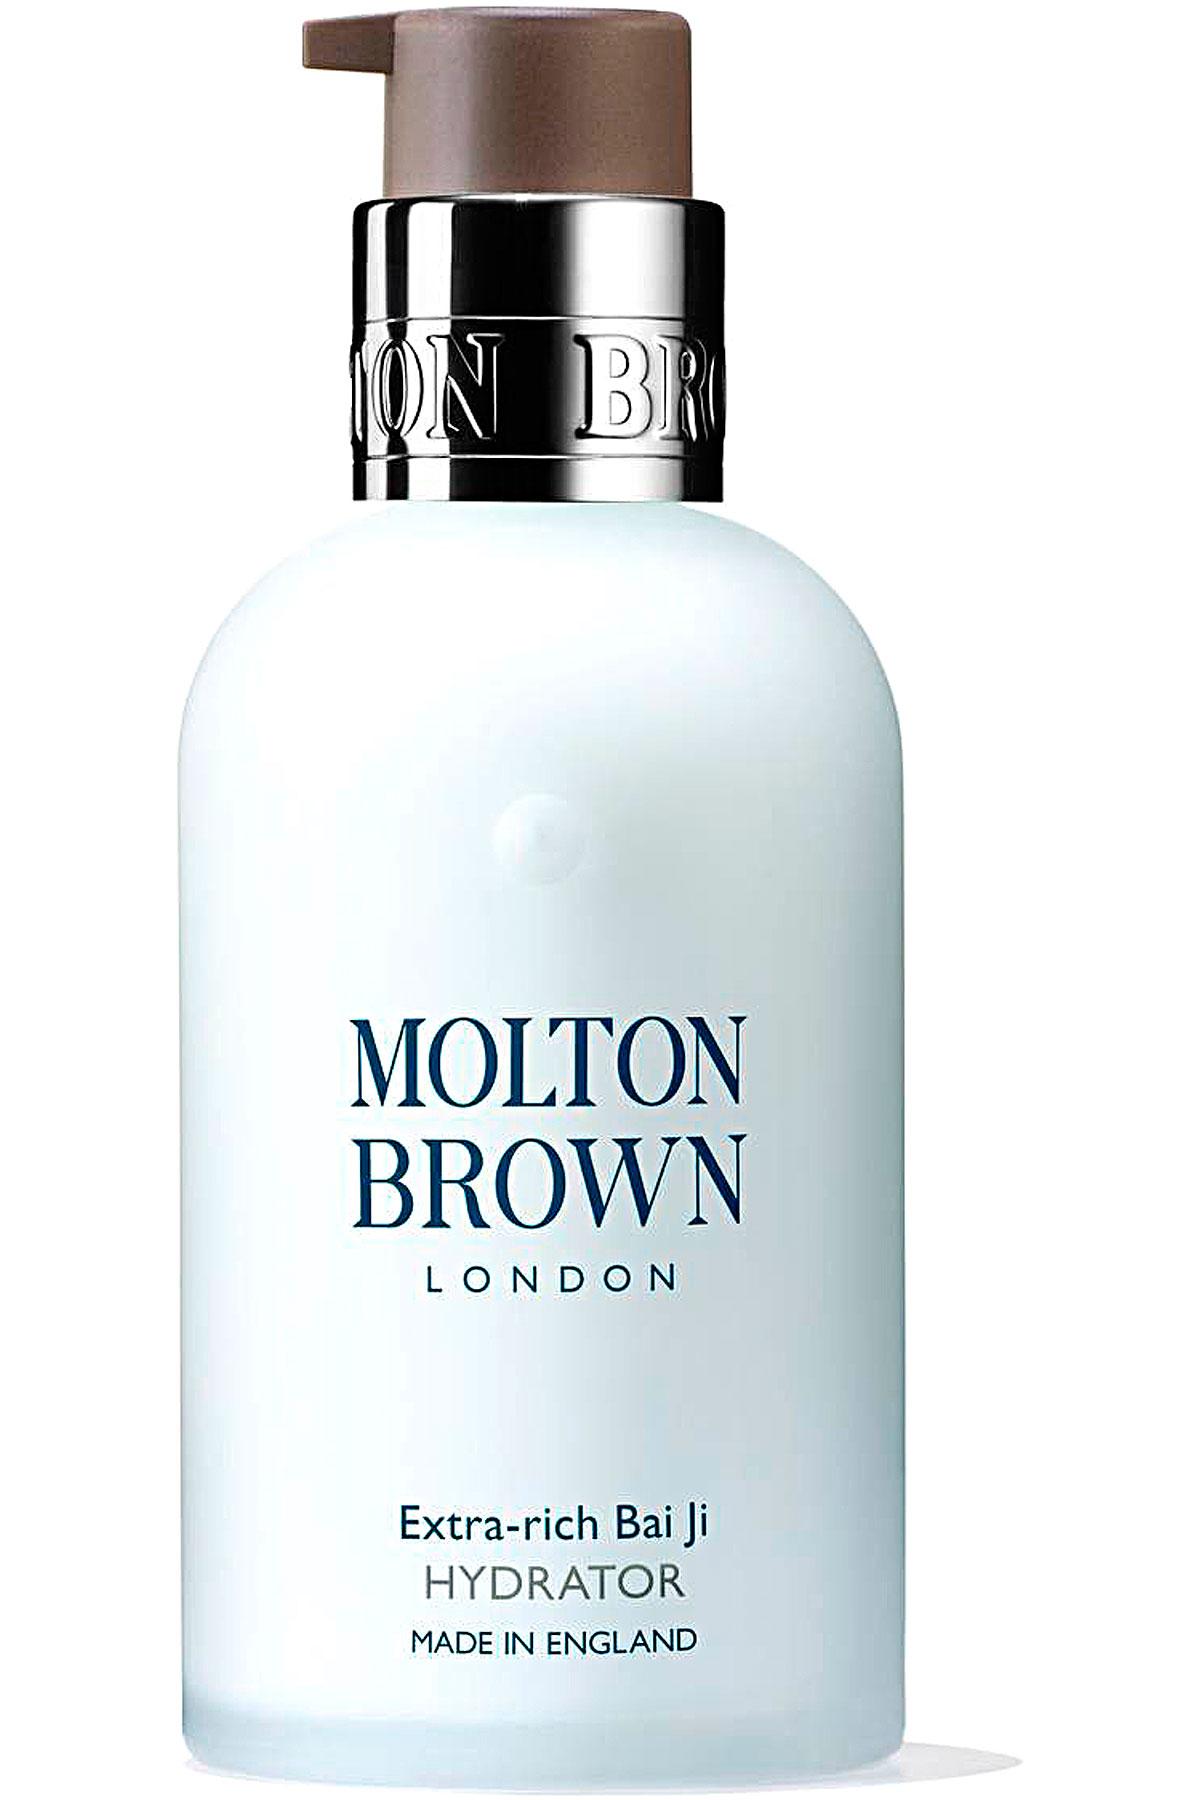 Molton Brown Beauty for Men, Extra-rich Bai Ji Hydrator - 100 Ml, 2019, 100 ml